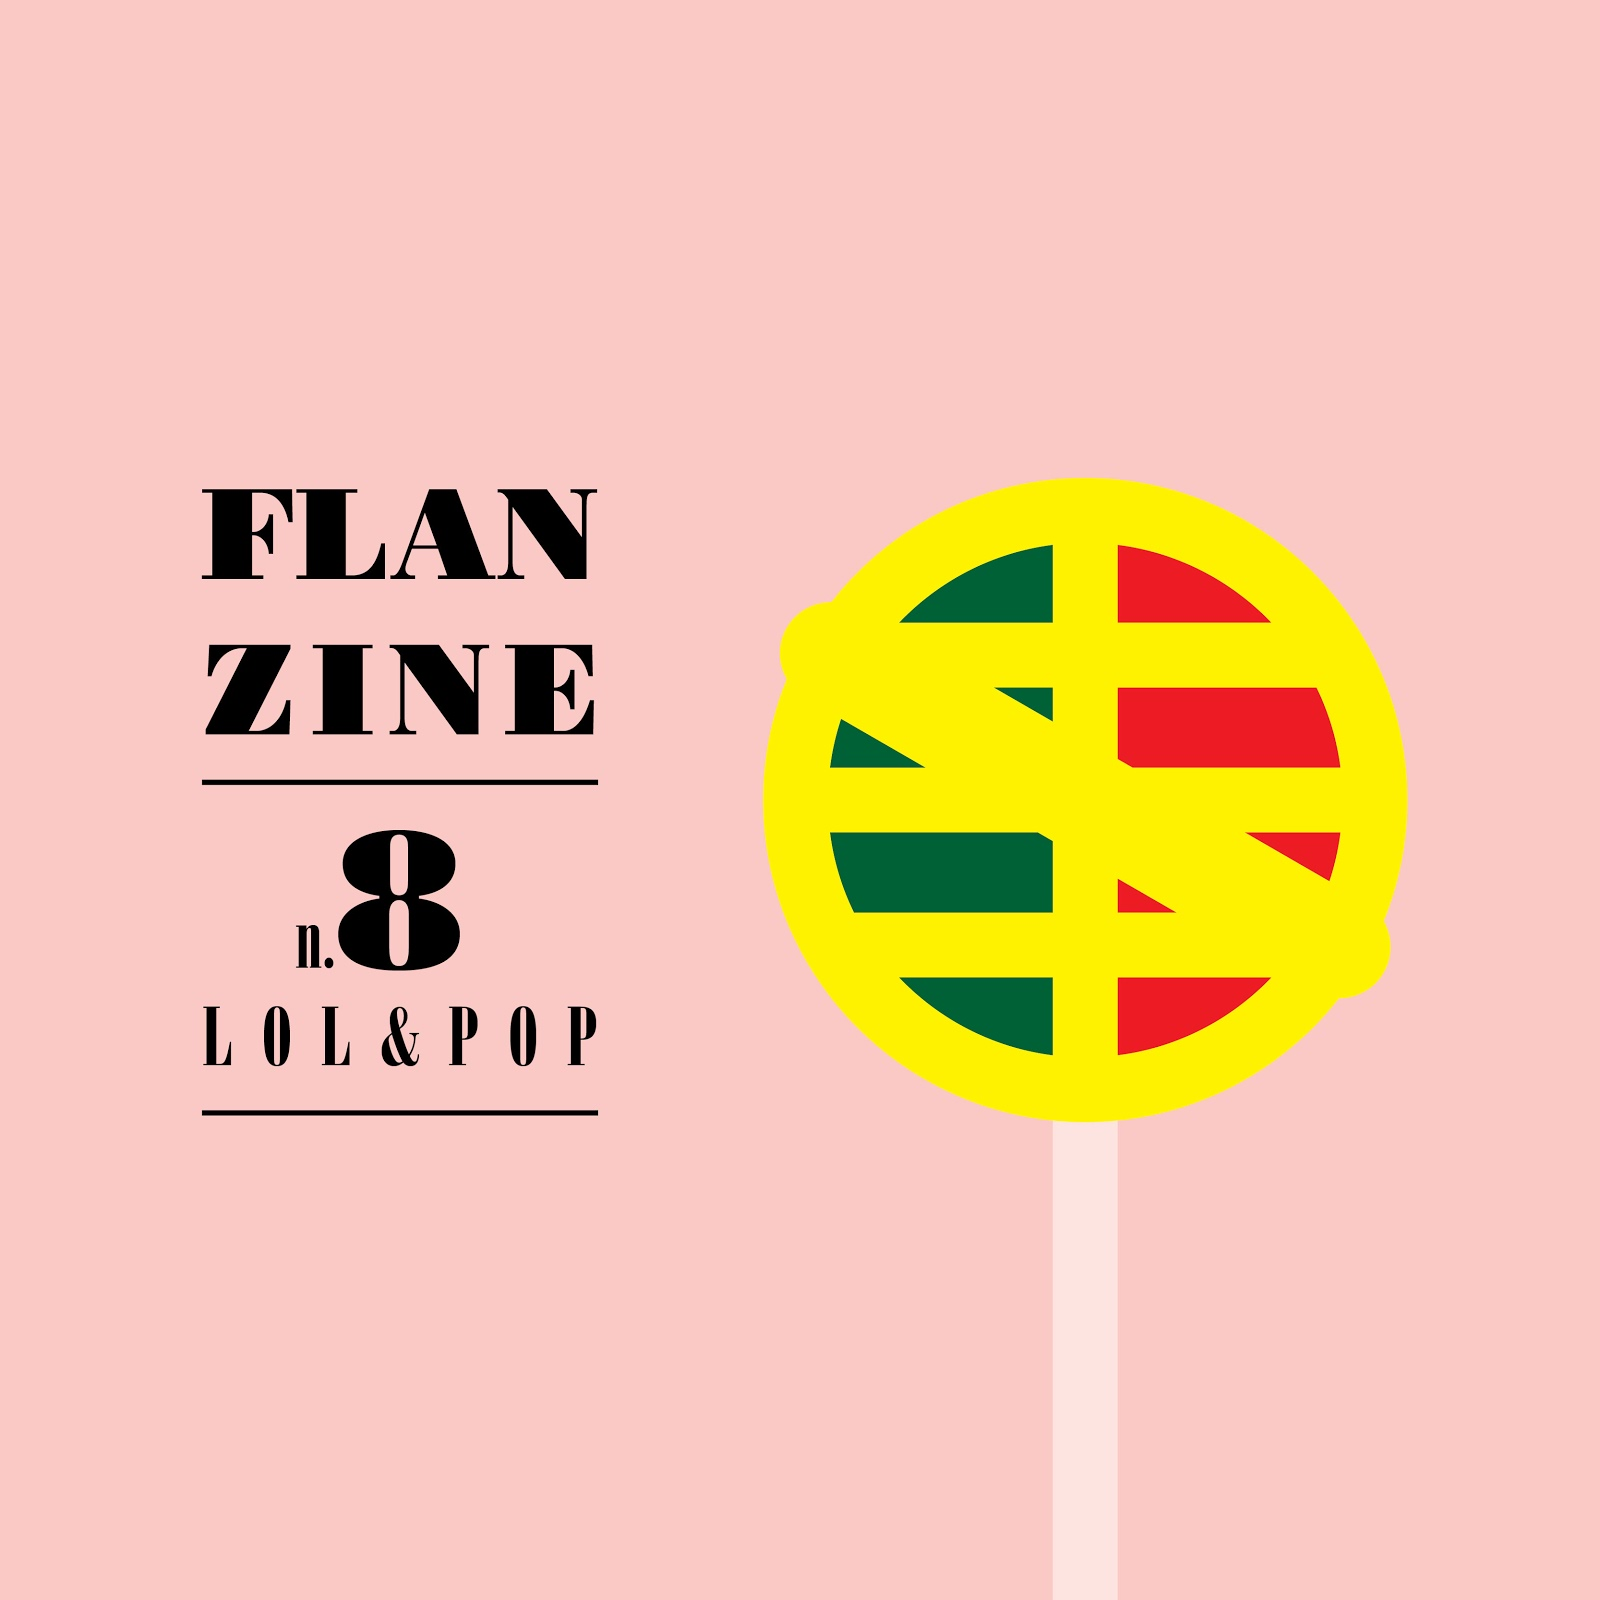 FLANZINE Nº8 - LOL&POP (Revista - FLAN DE TAL)